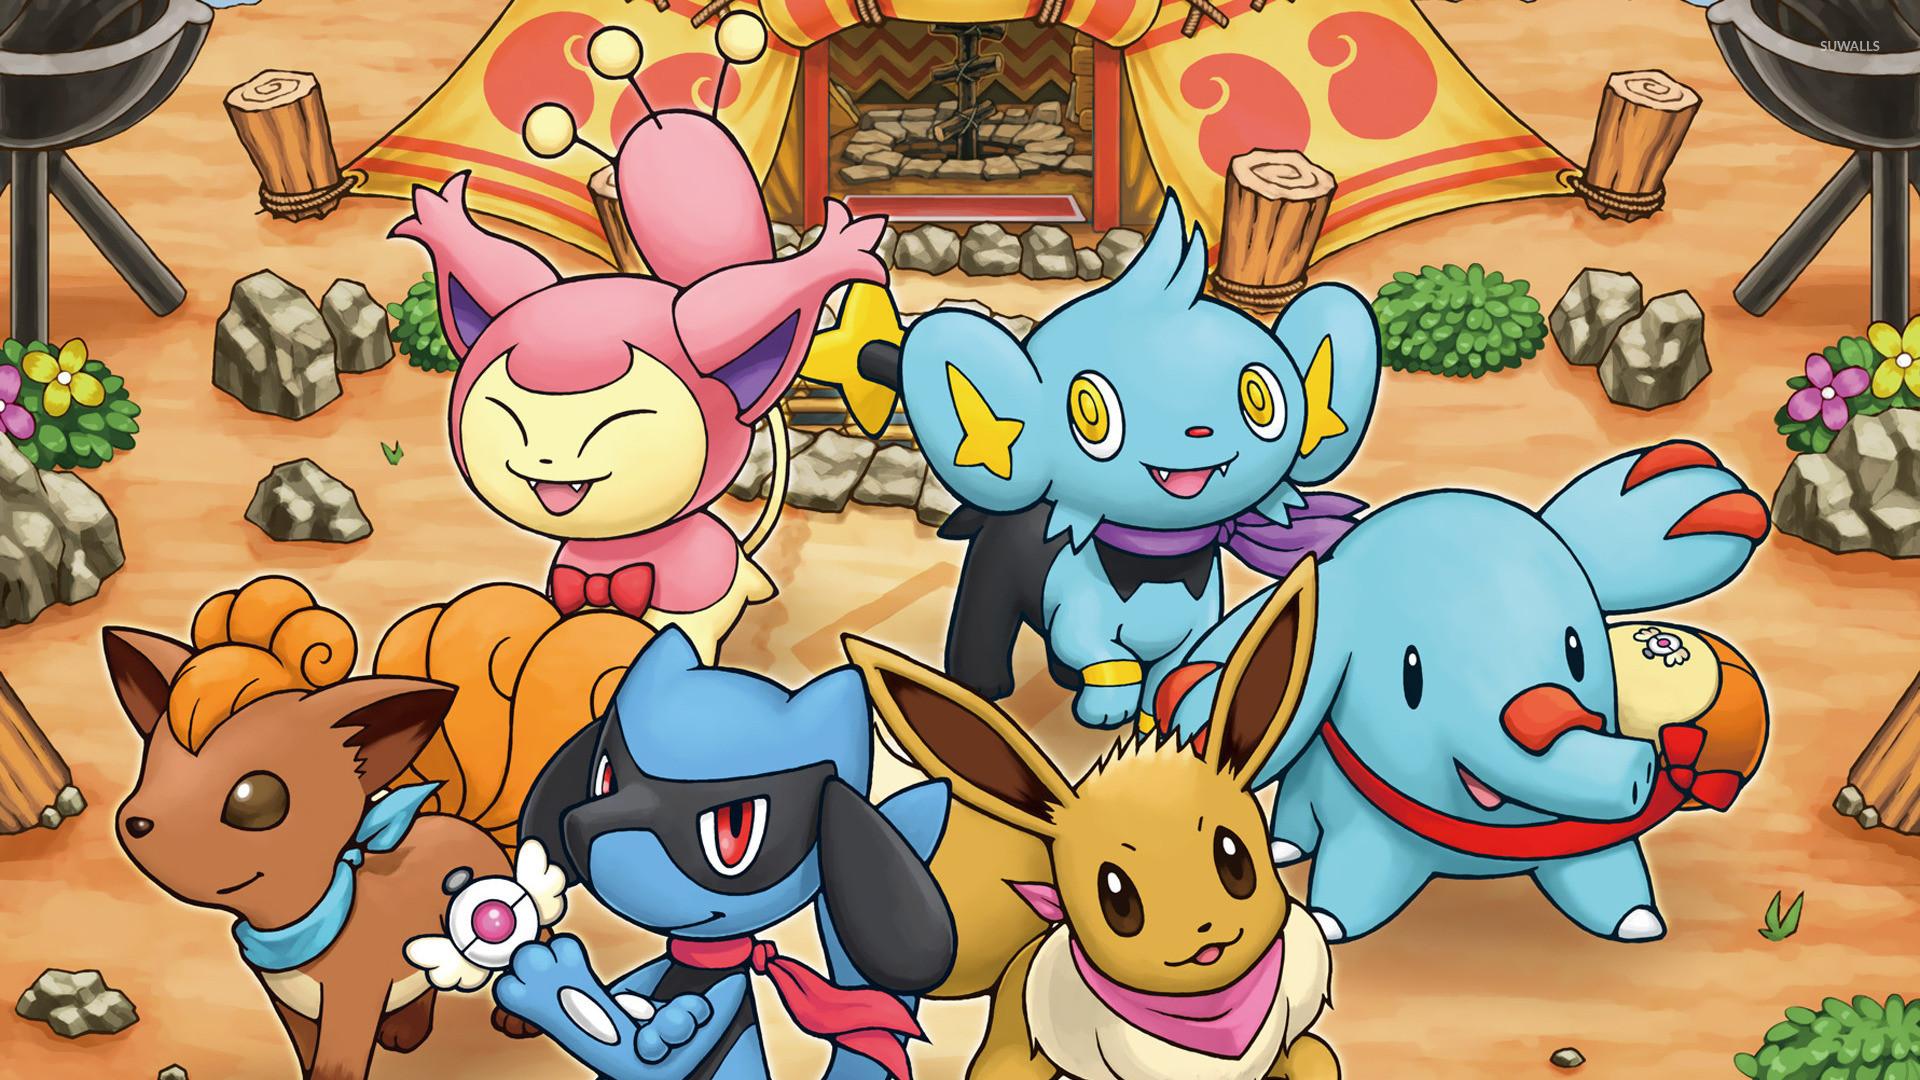 Pokemon Mystery Dungeon Backgrounds, HQ, Killian Goldin